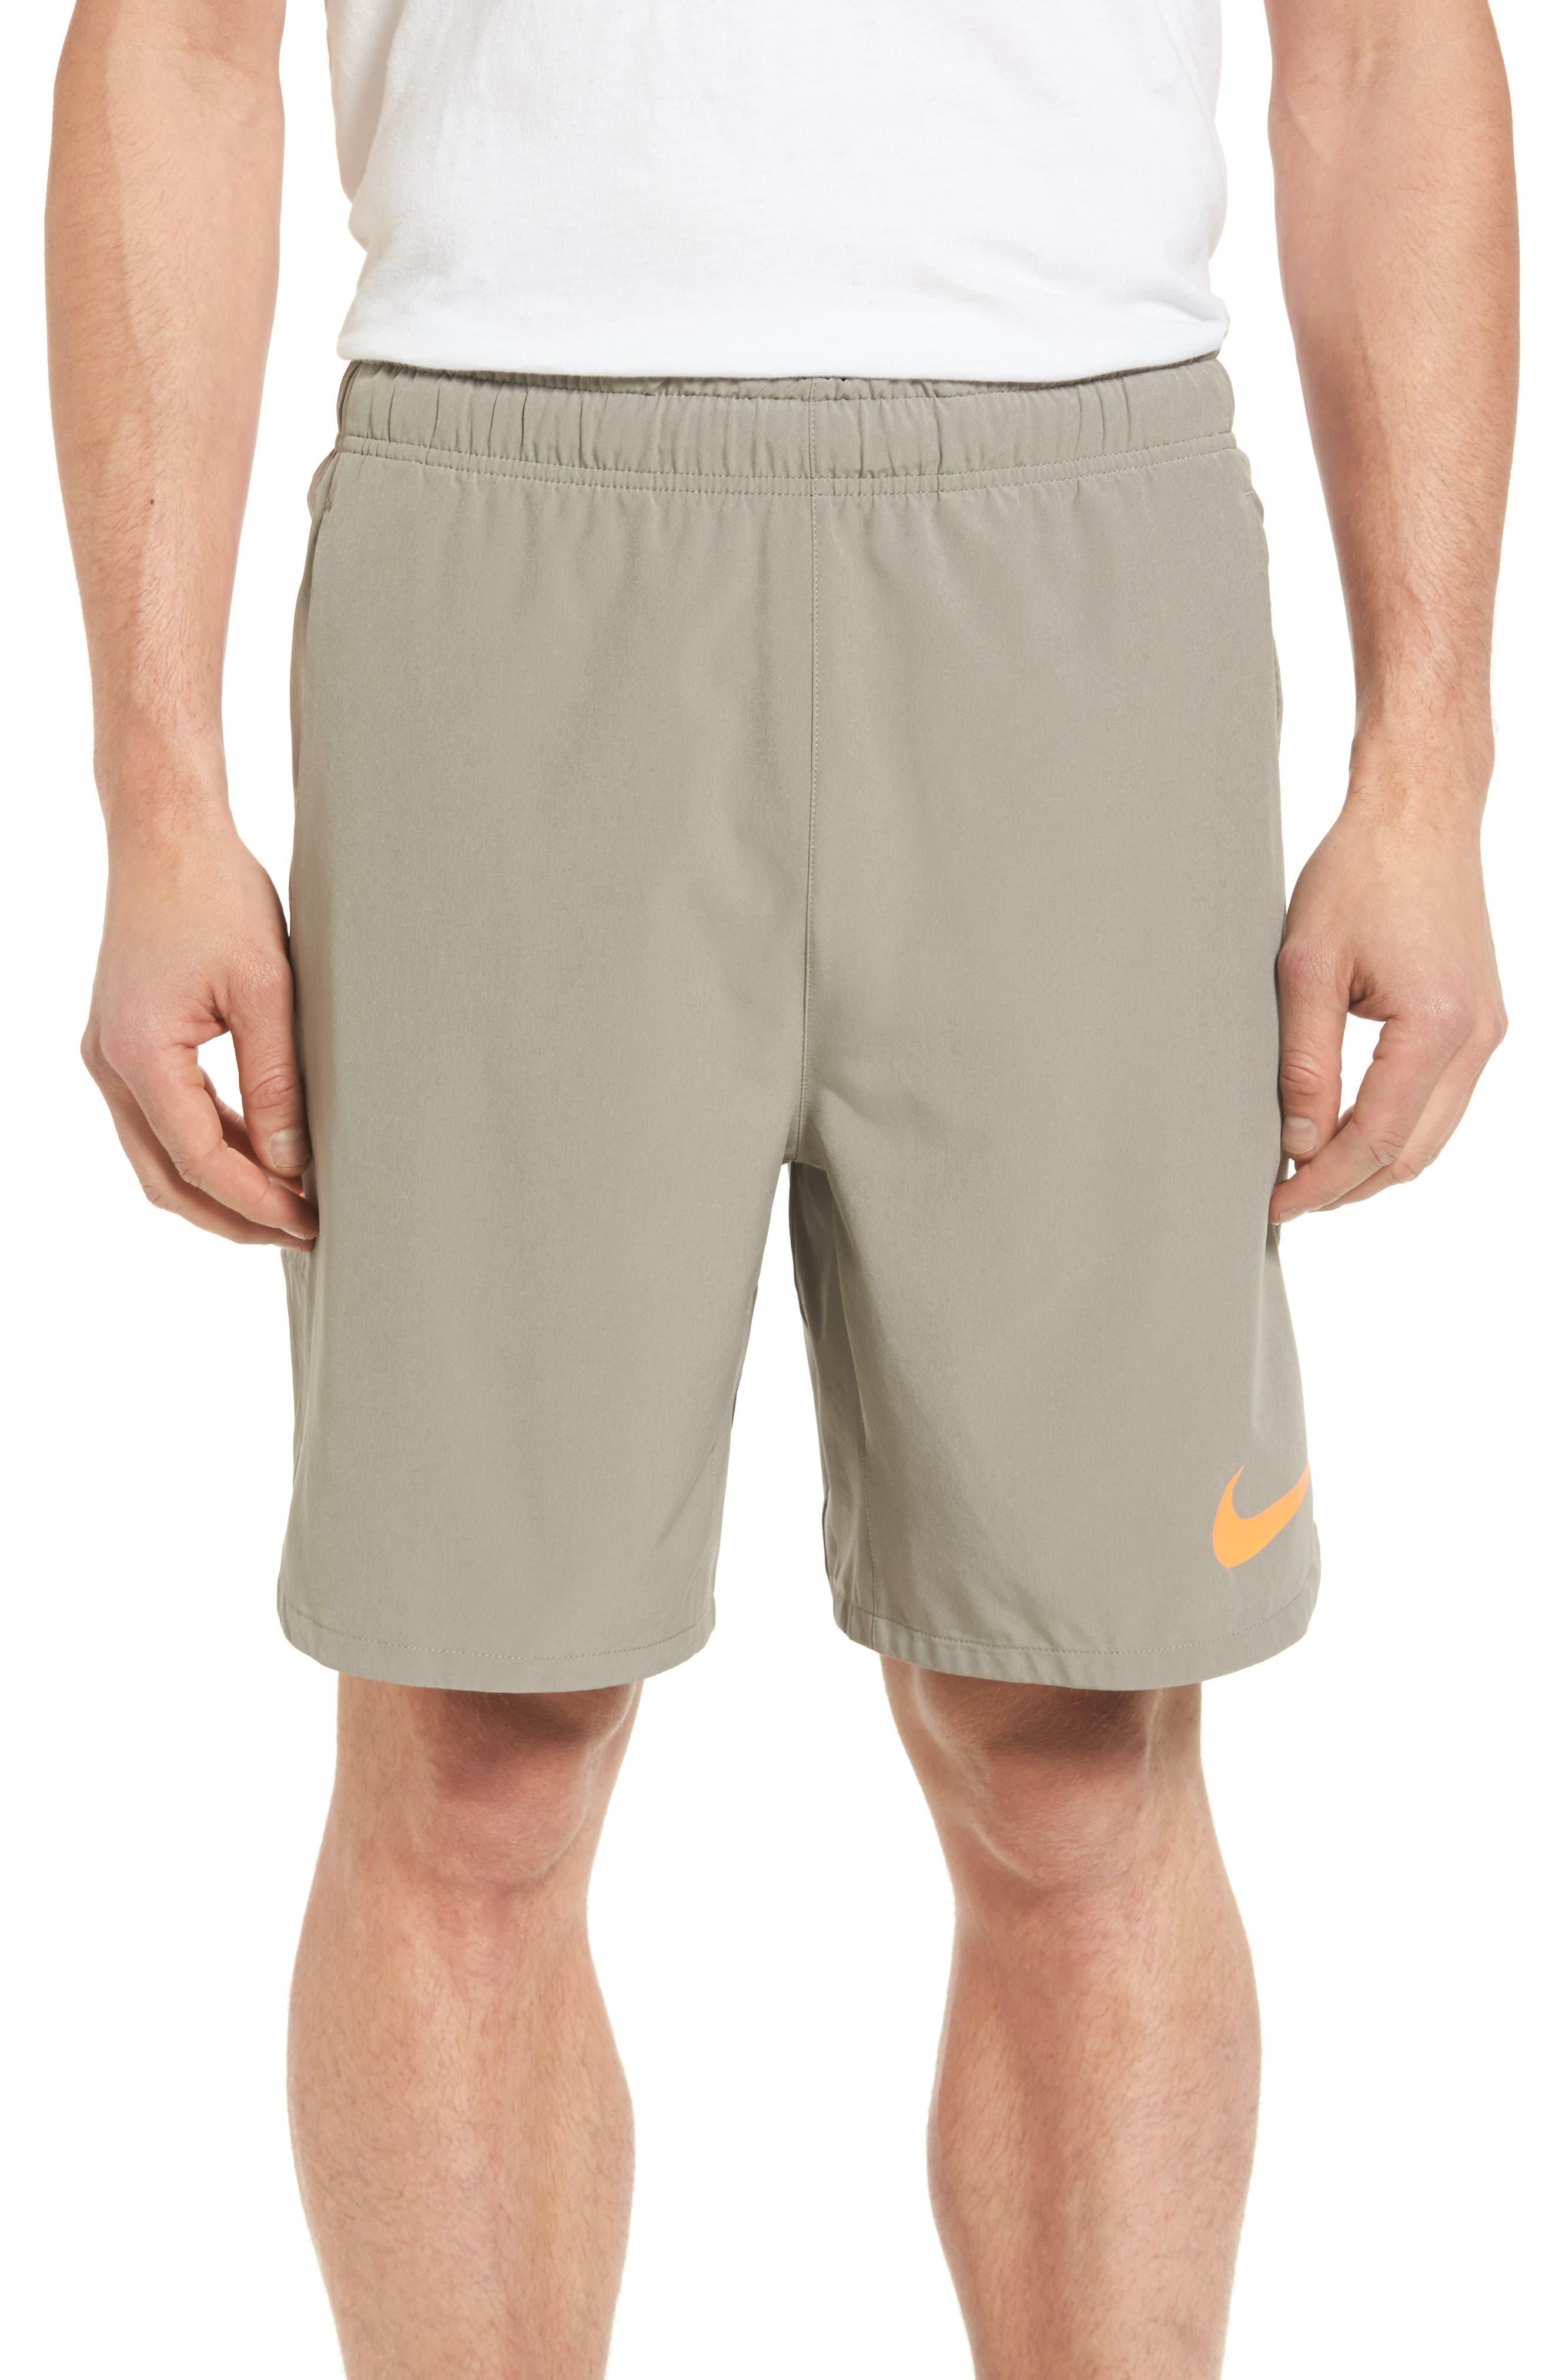 Flex Training Shorts,                             Main thumbnail 1, color,